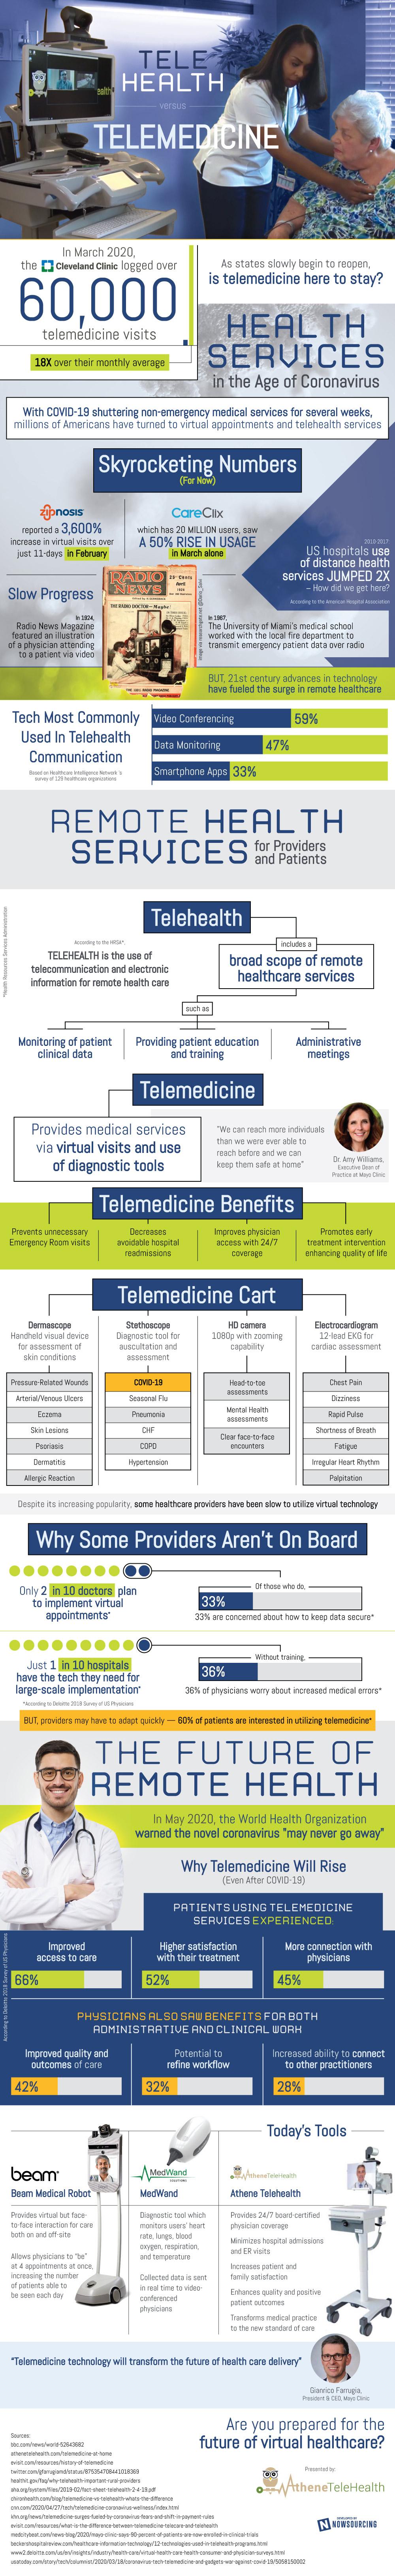 The Rising Popularity Of Telemedicine 2